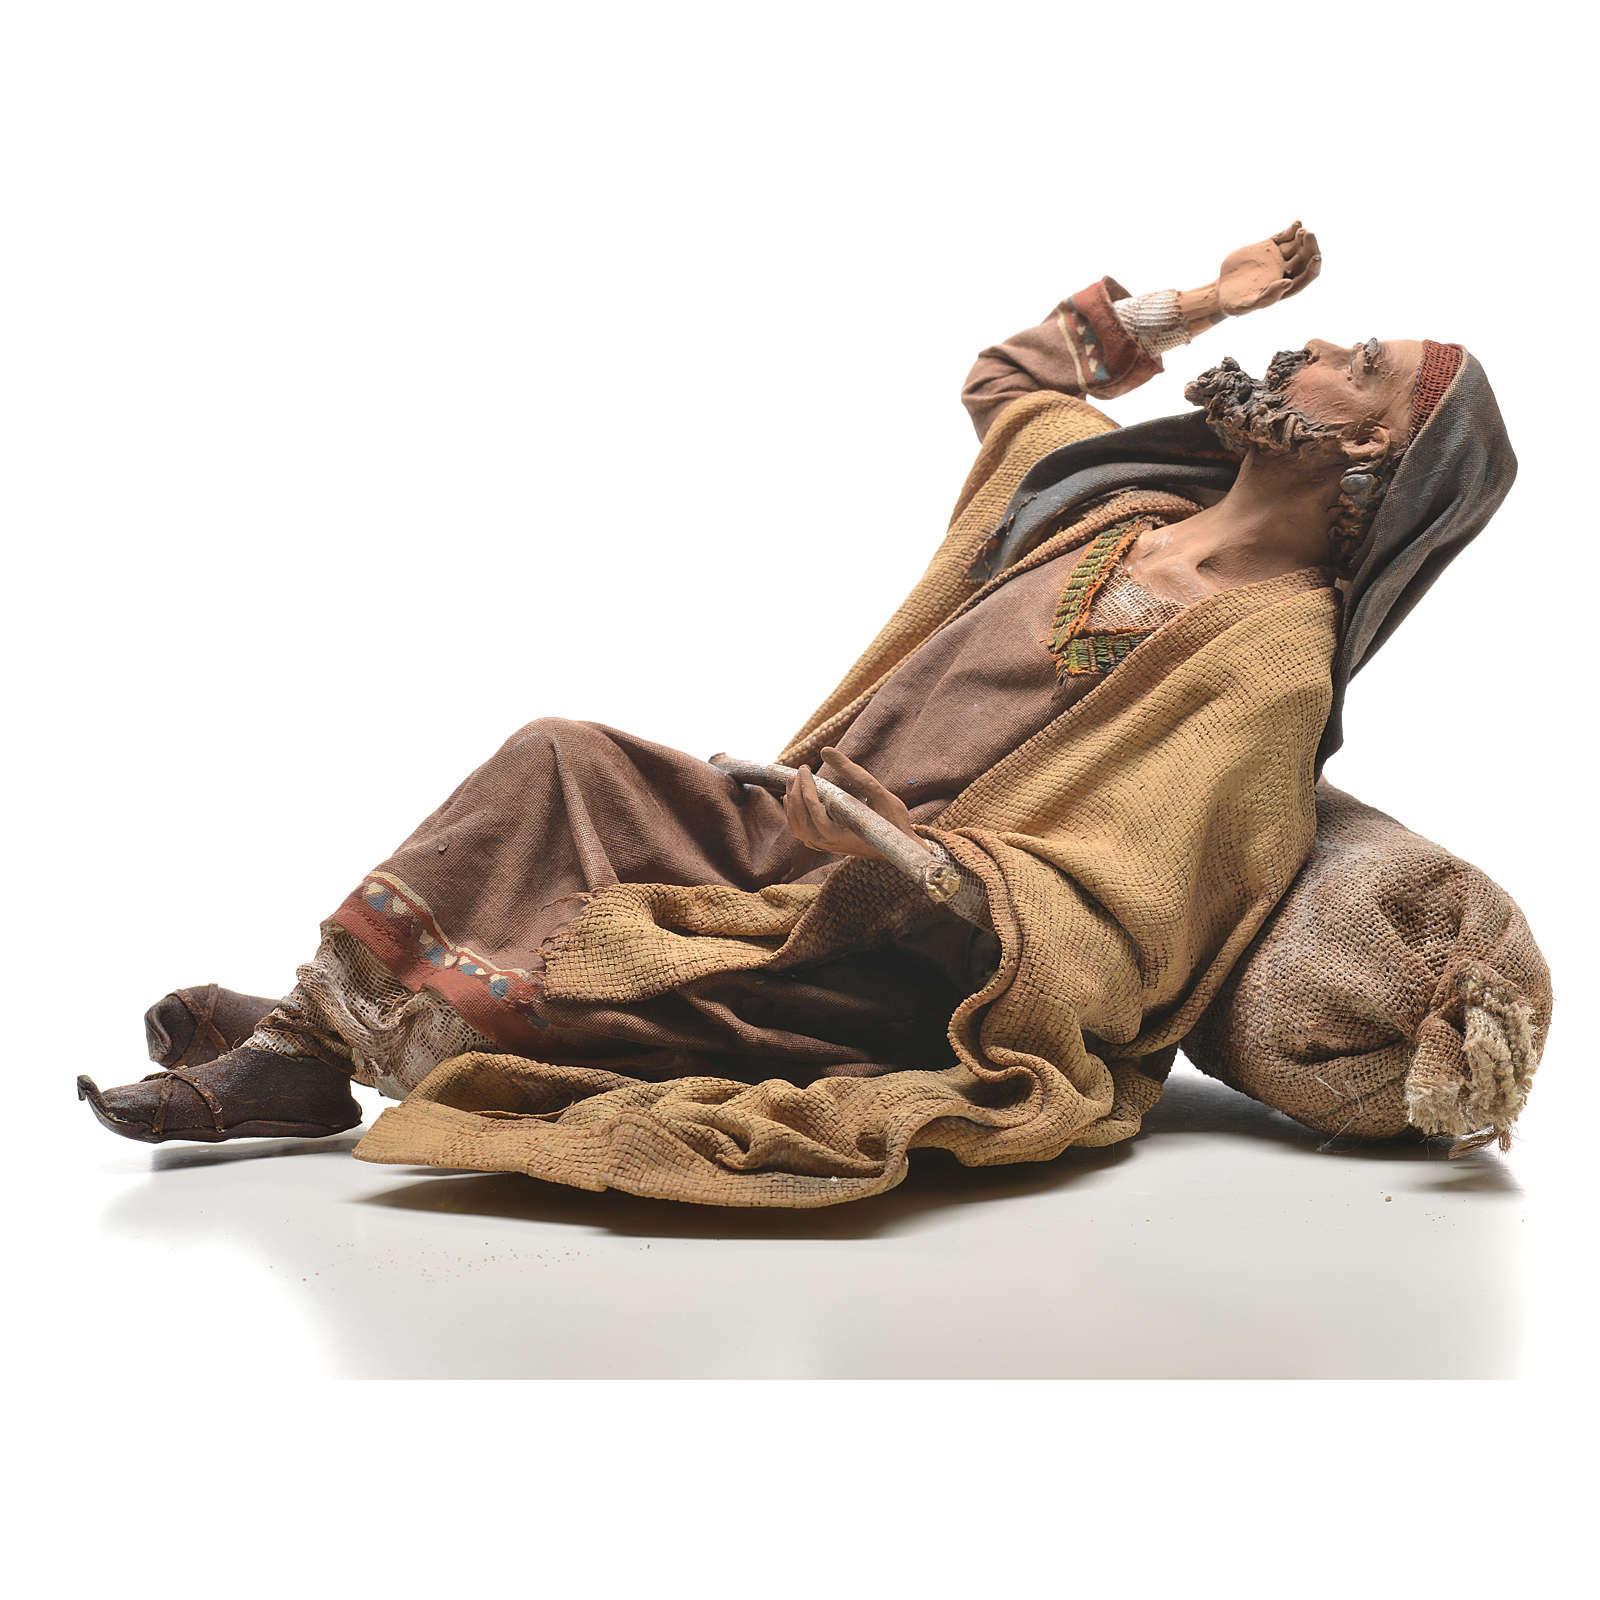 Meravigliato 30 cm Presepe Angela Tripi 4